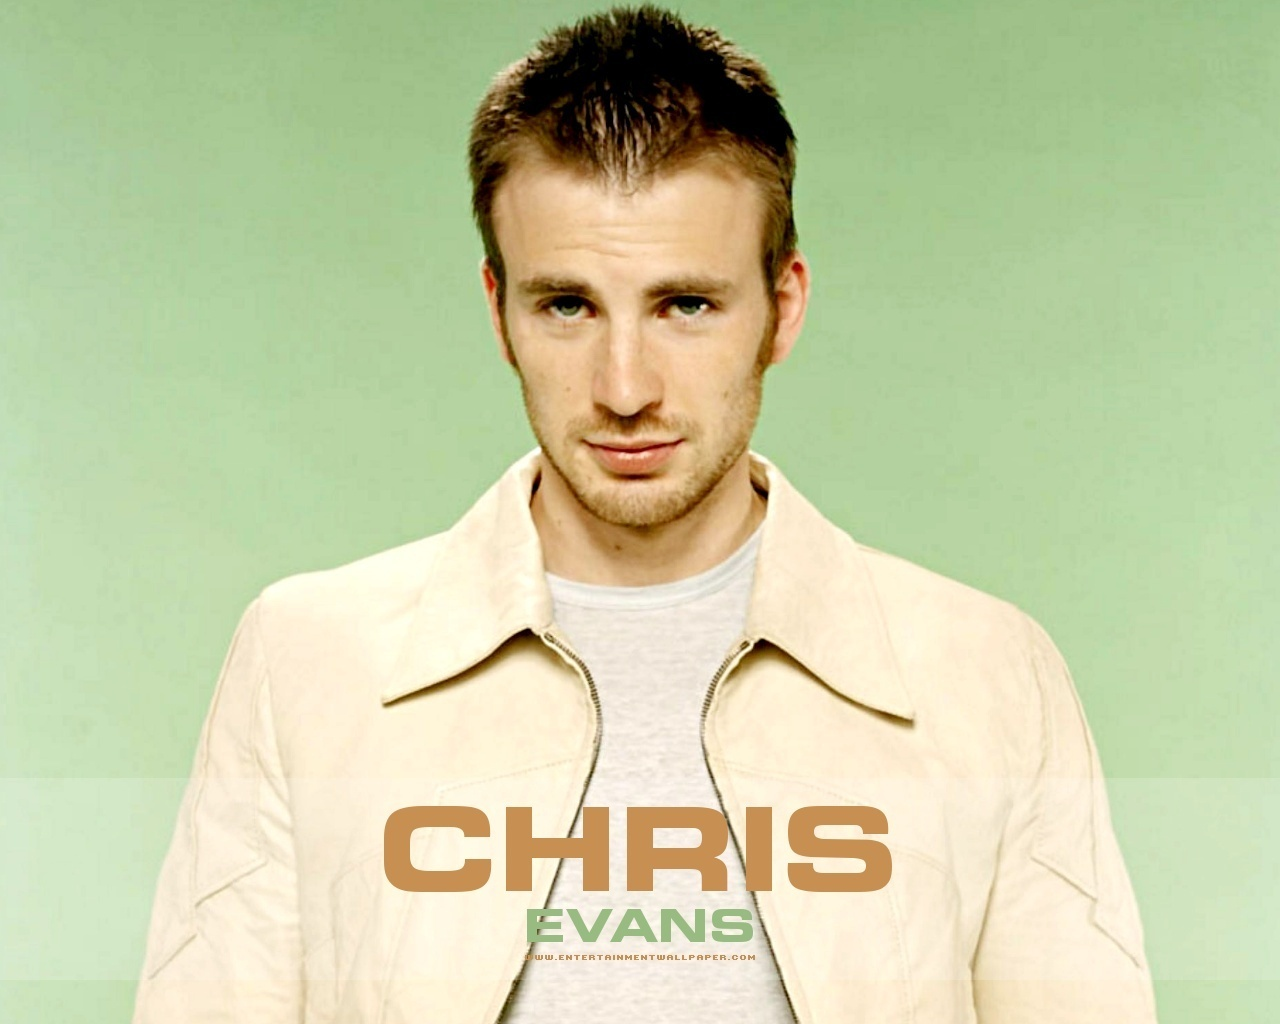 Chris - chris-evans wallpaper